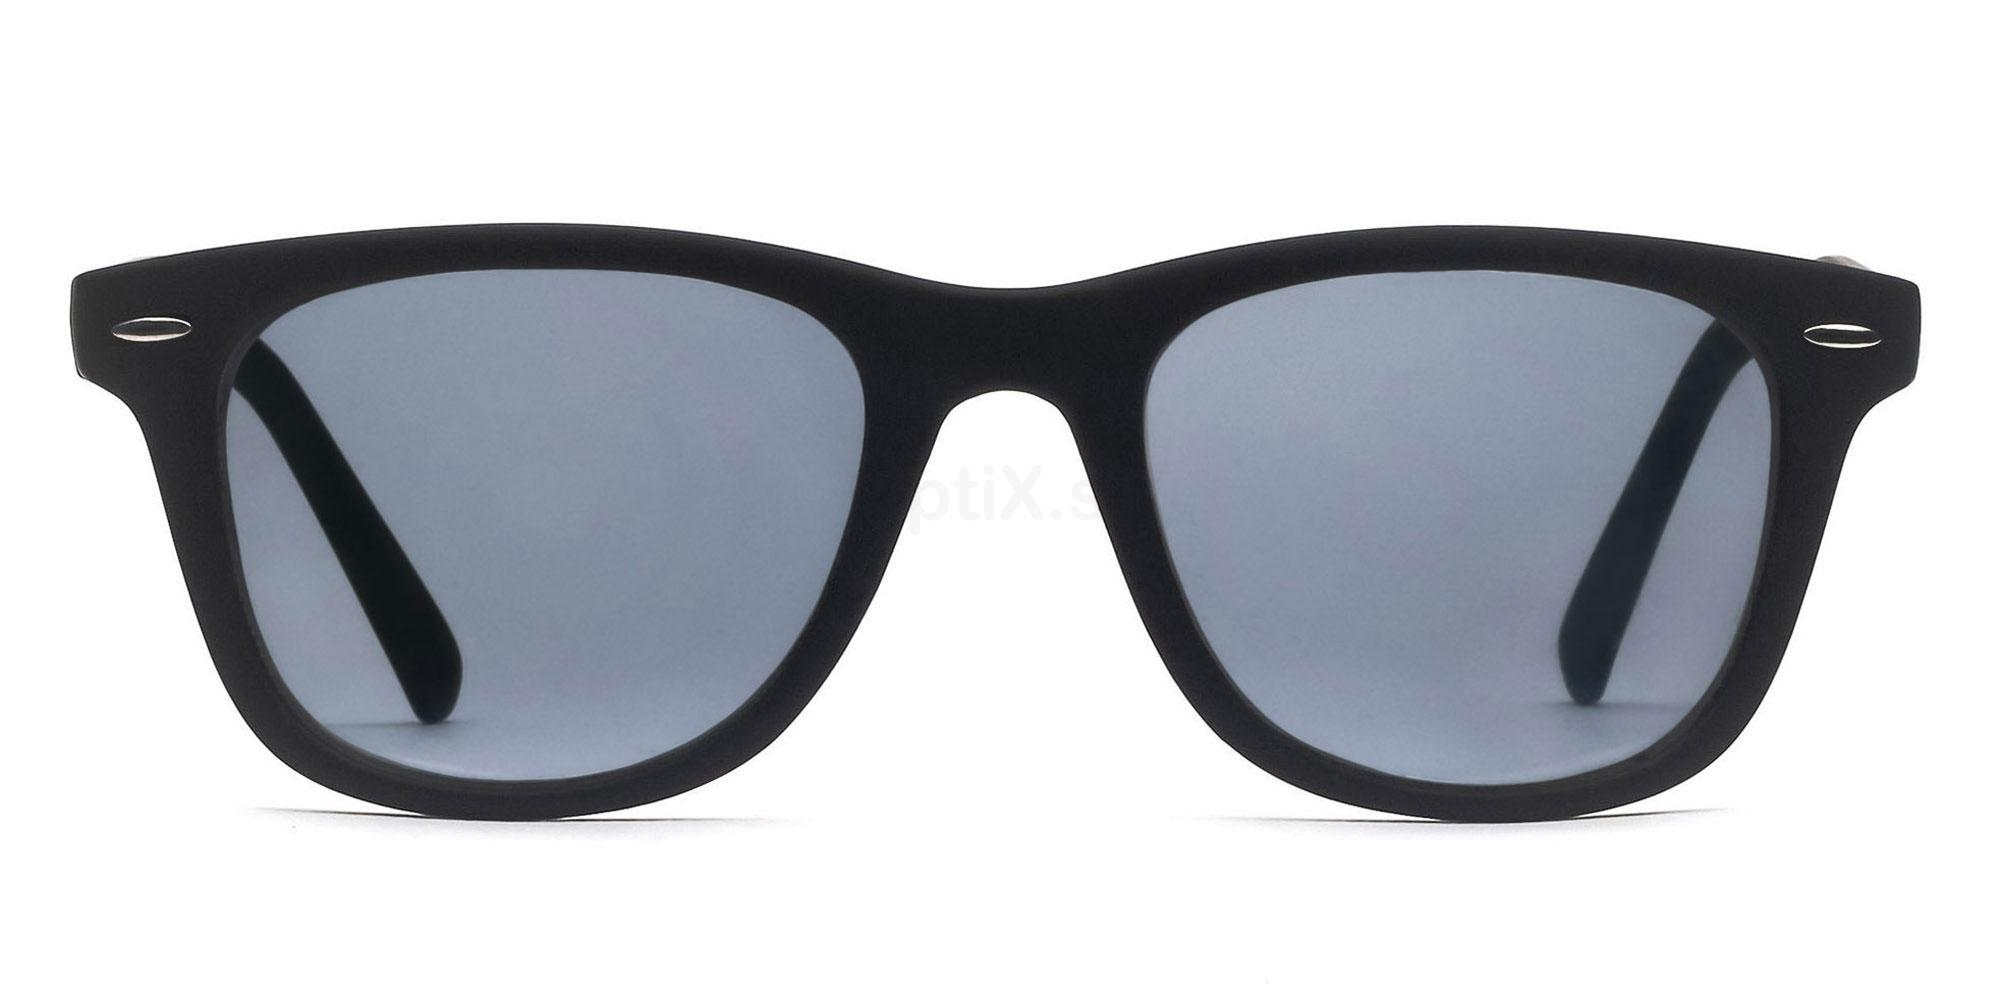 C1 8121 - Black (Sunglasses) , Savannah